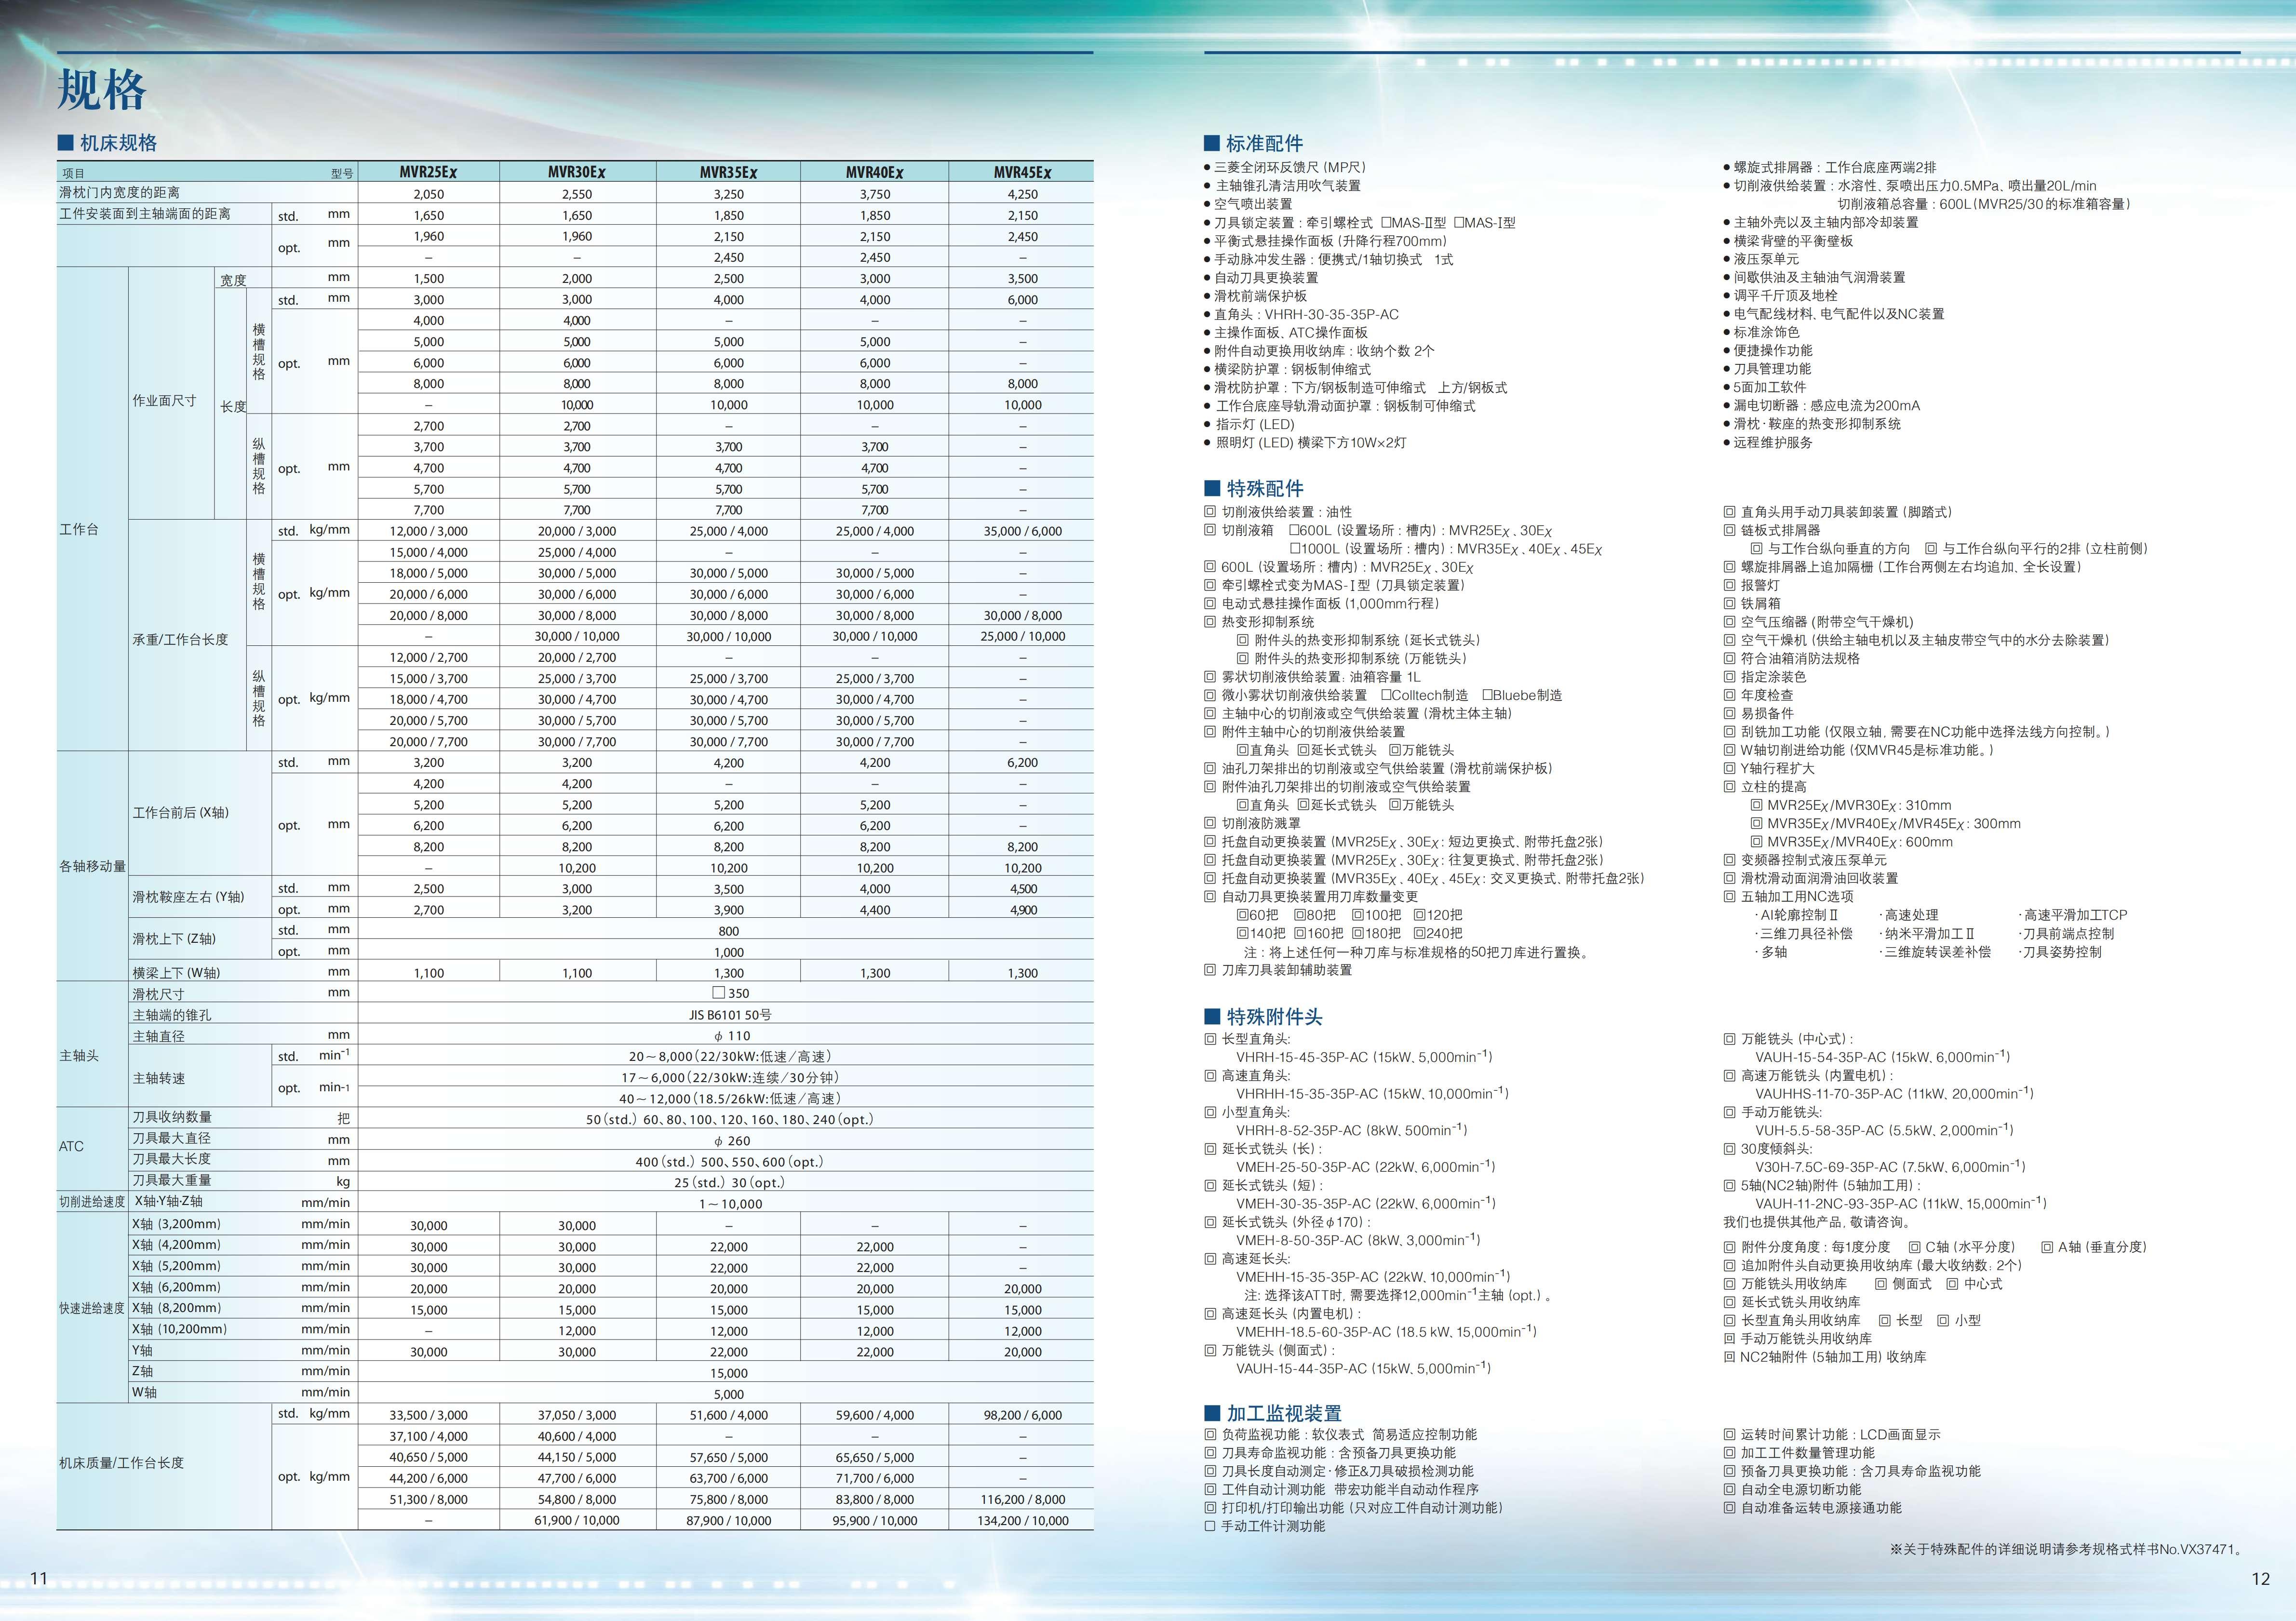 WPS图片批量处理-No.27_MVREx_Web_1014_06